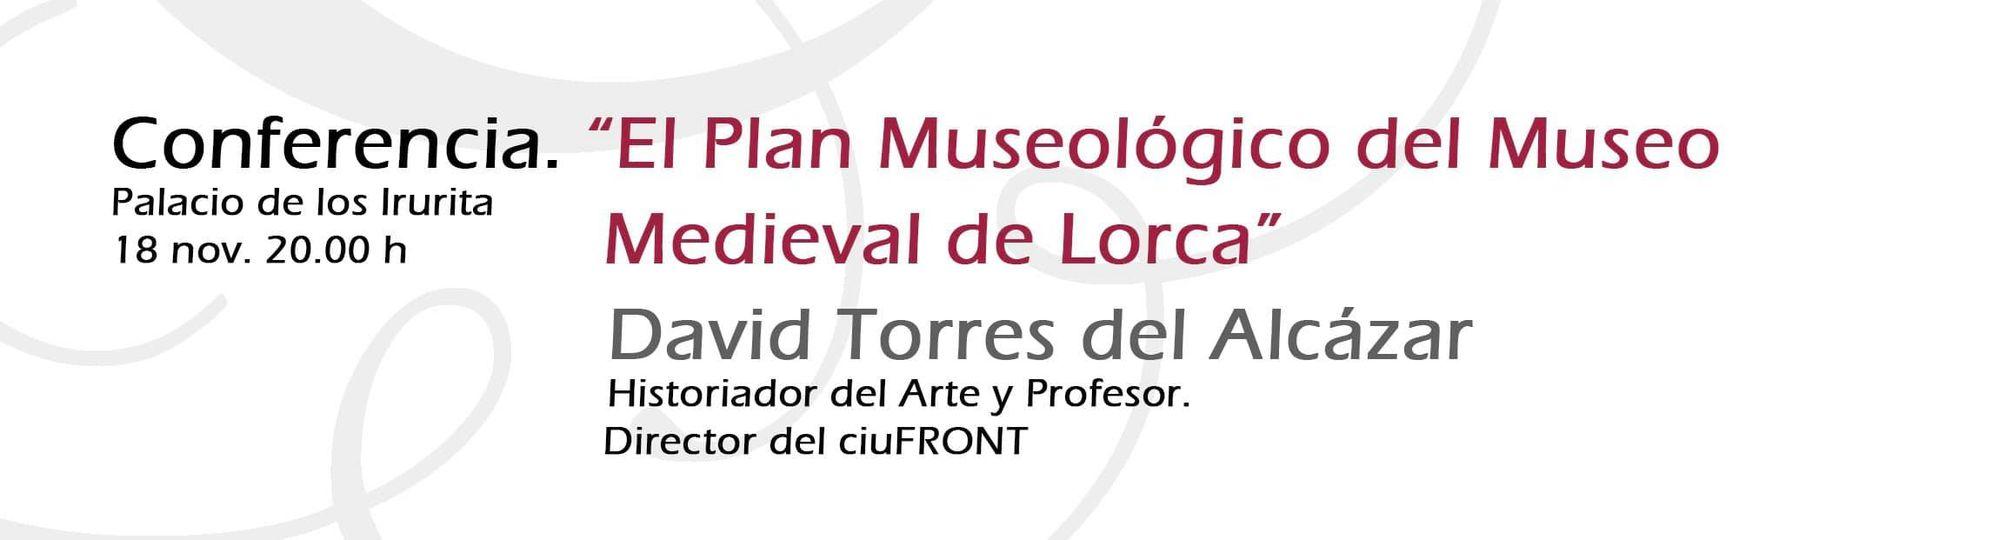 conferencia museo Lorcaconferencia museo Lorca